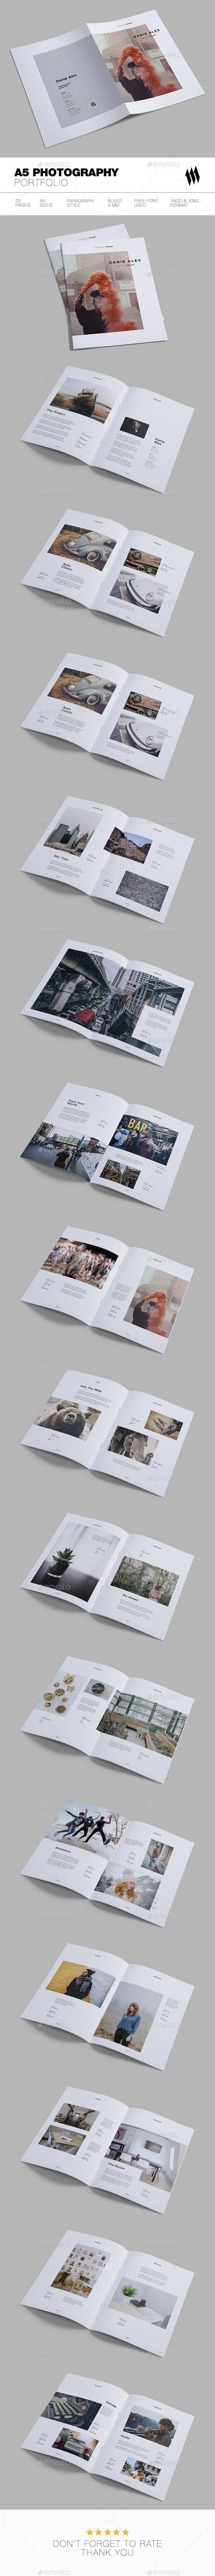 A5 Photographer Portfolio Brochure Template InDesign INDD